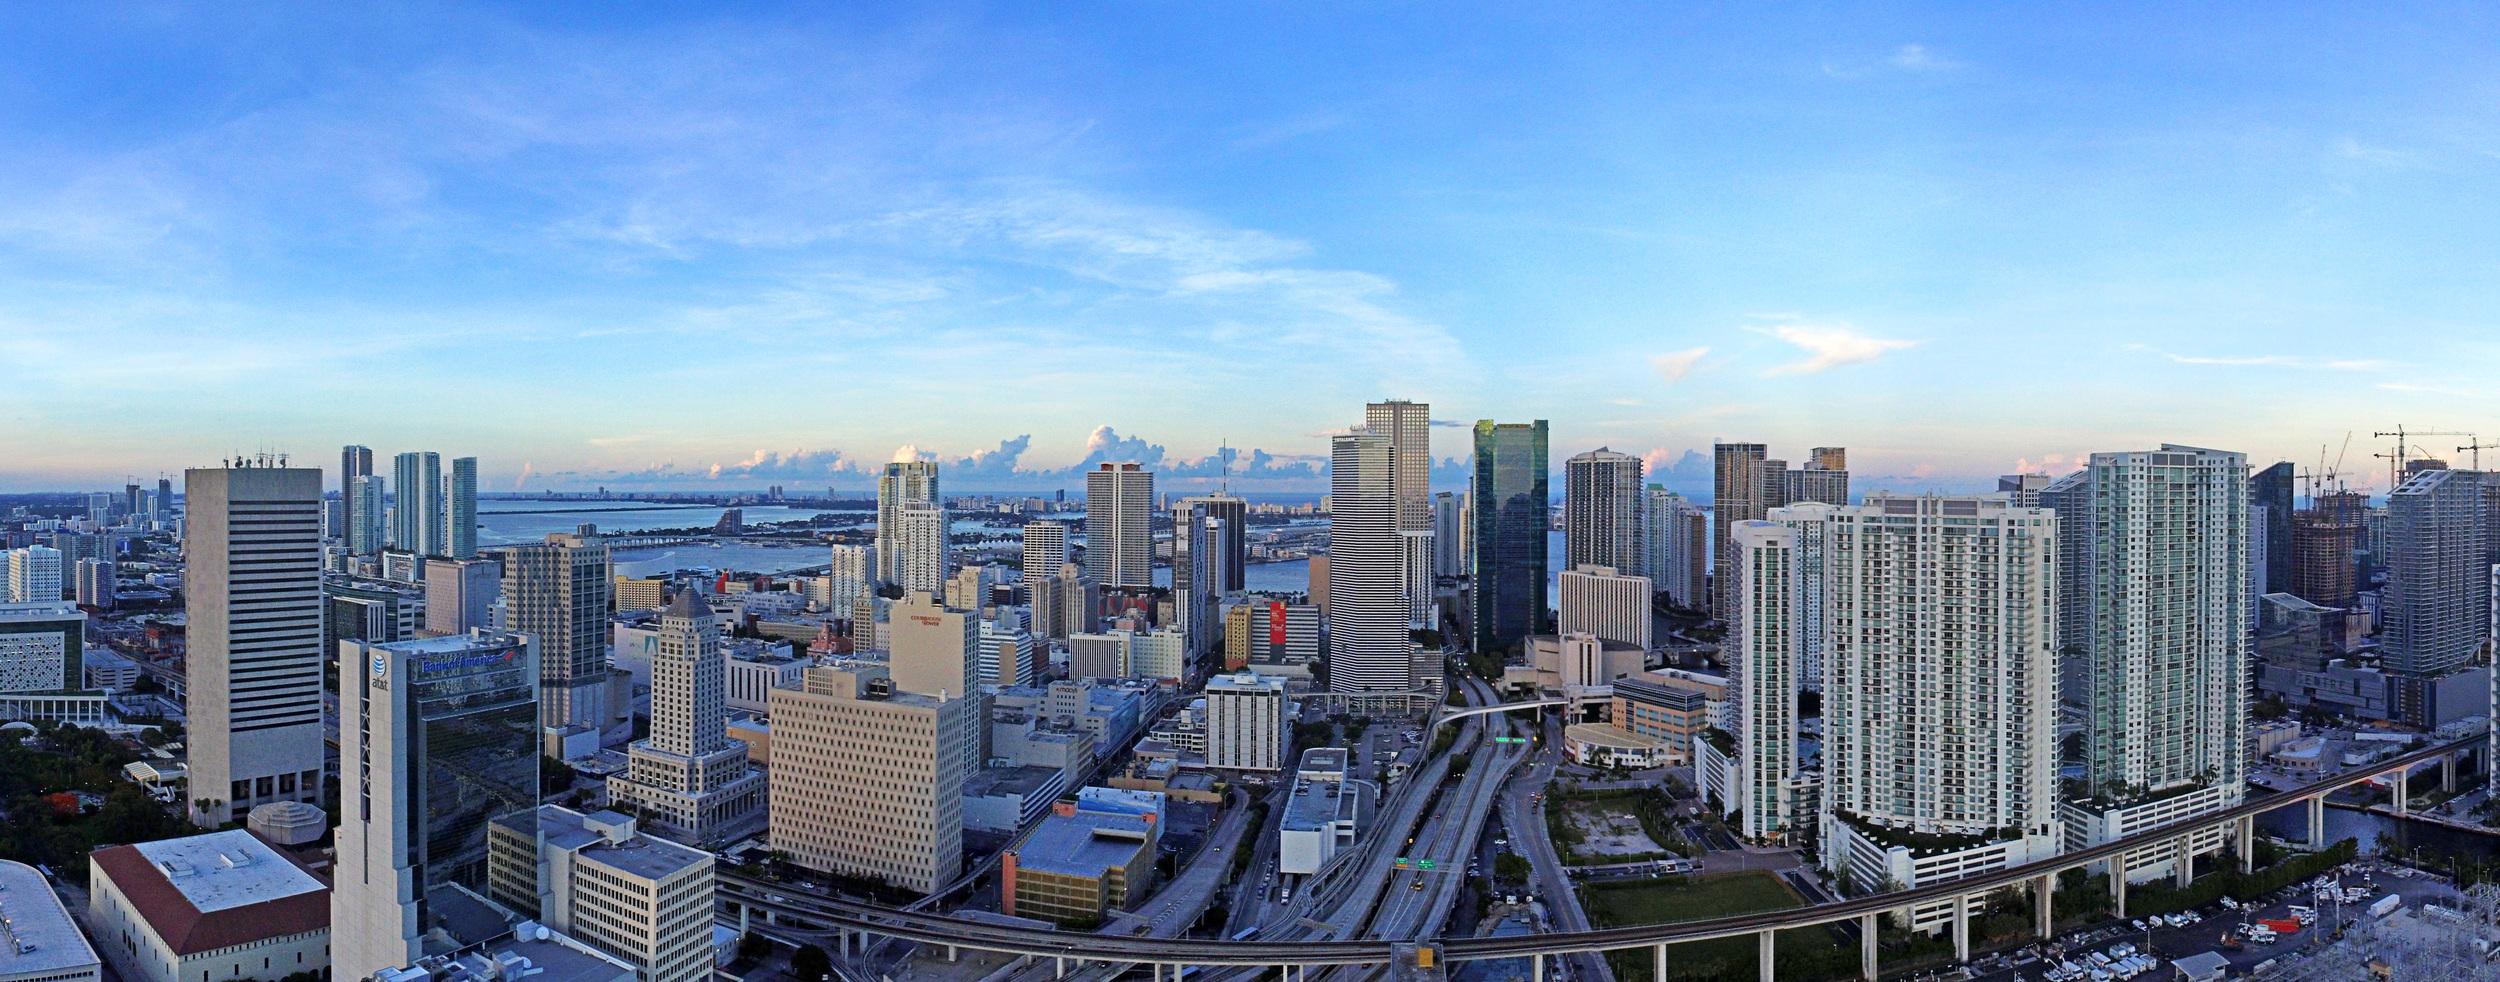 Skyline Panoramic - Downtown Miami, FL